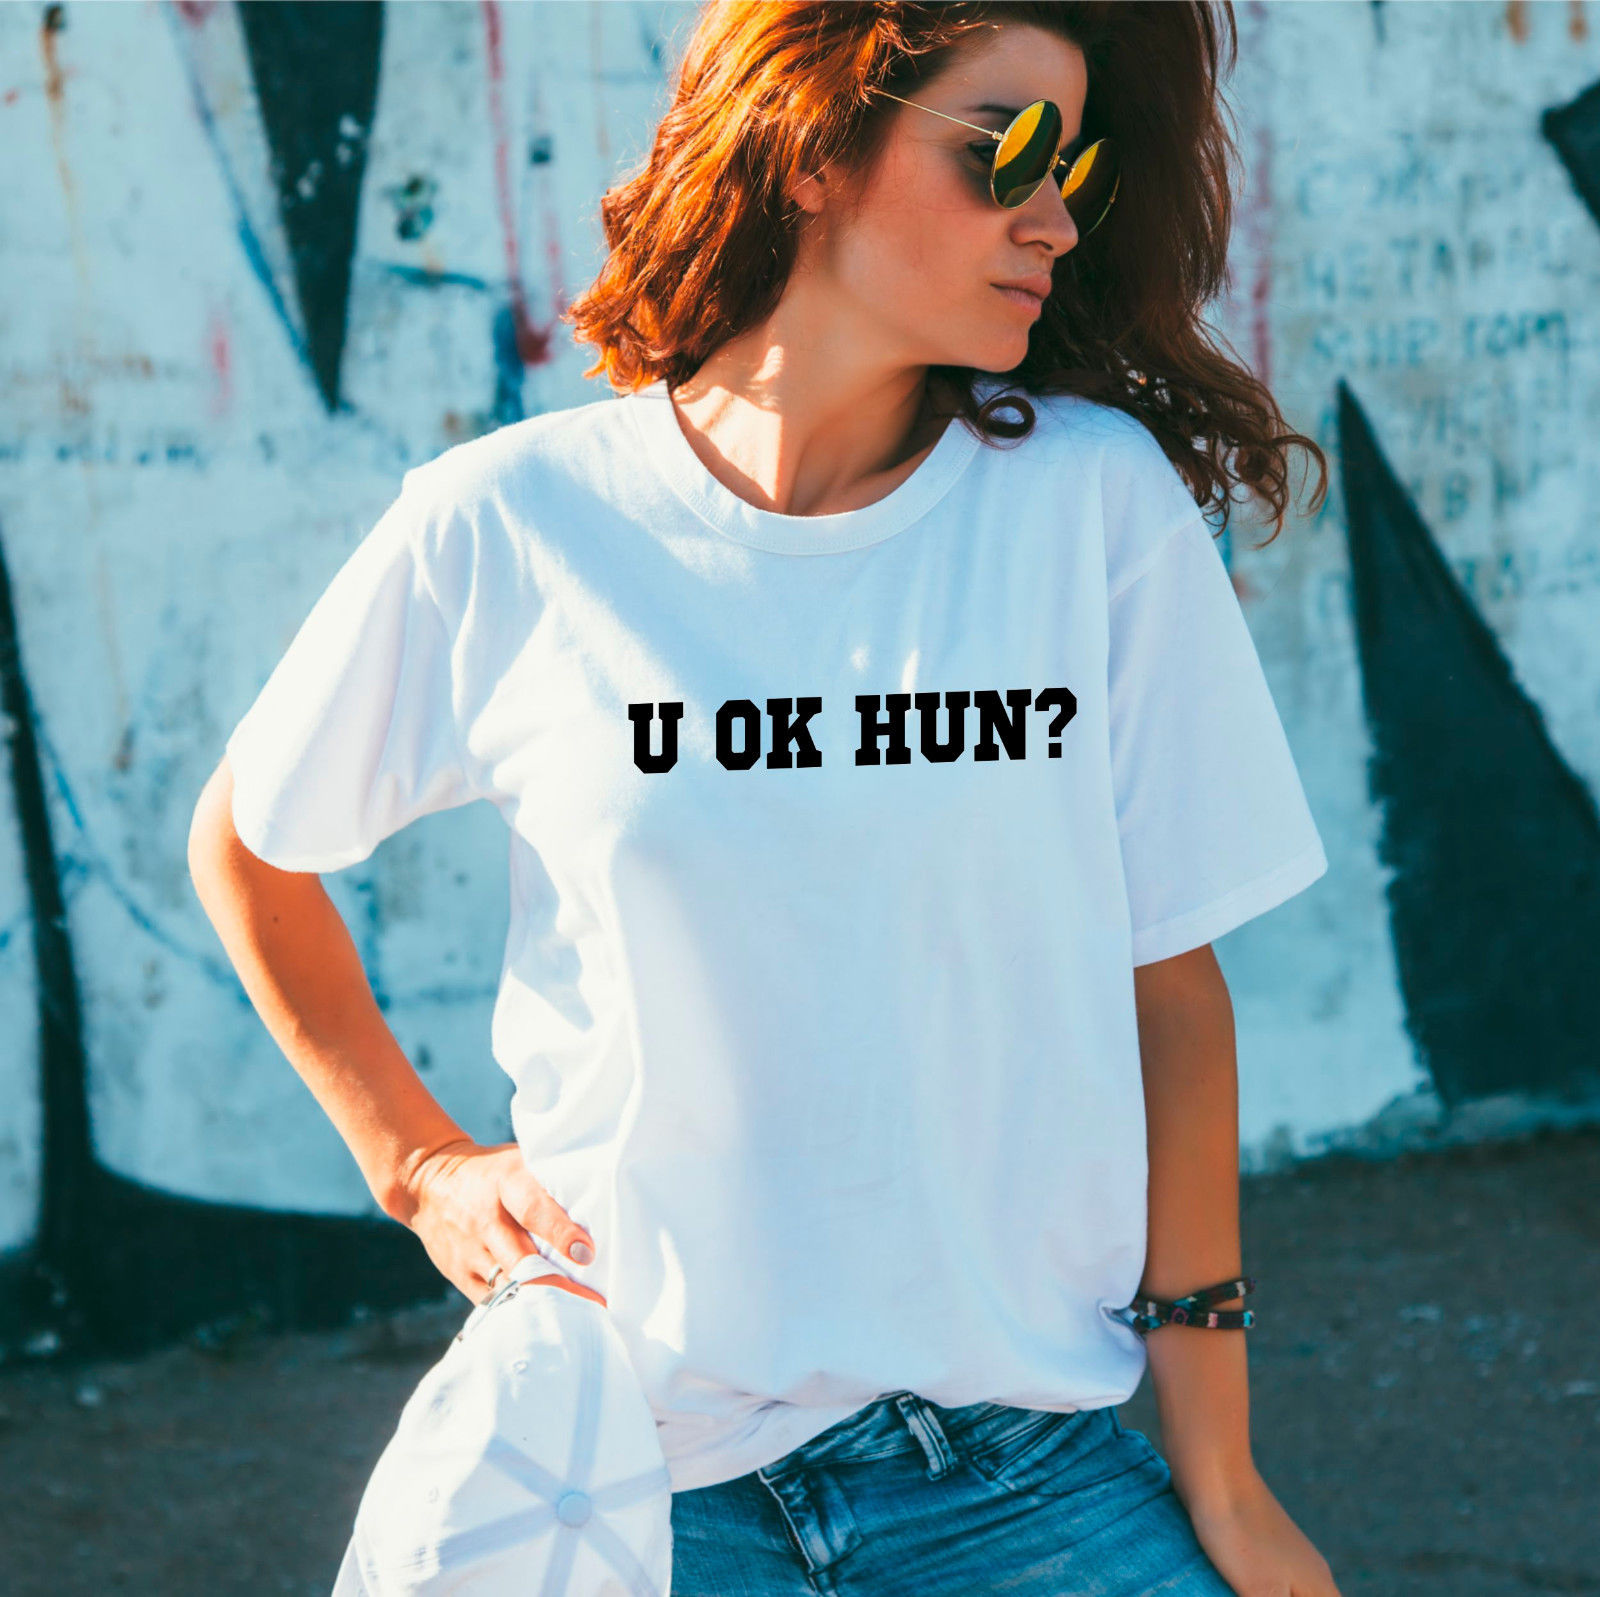 U Ok Hun? T-shirt, Gift For Her, Slogan Sarcastic Shirt,Funny T-shirt New T Shirts Funny Tops Tee Unisex